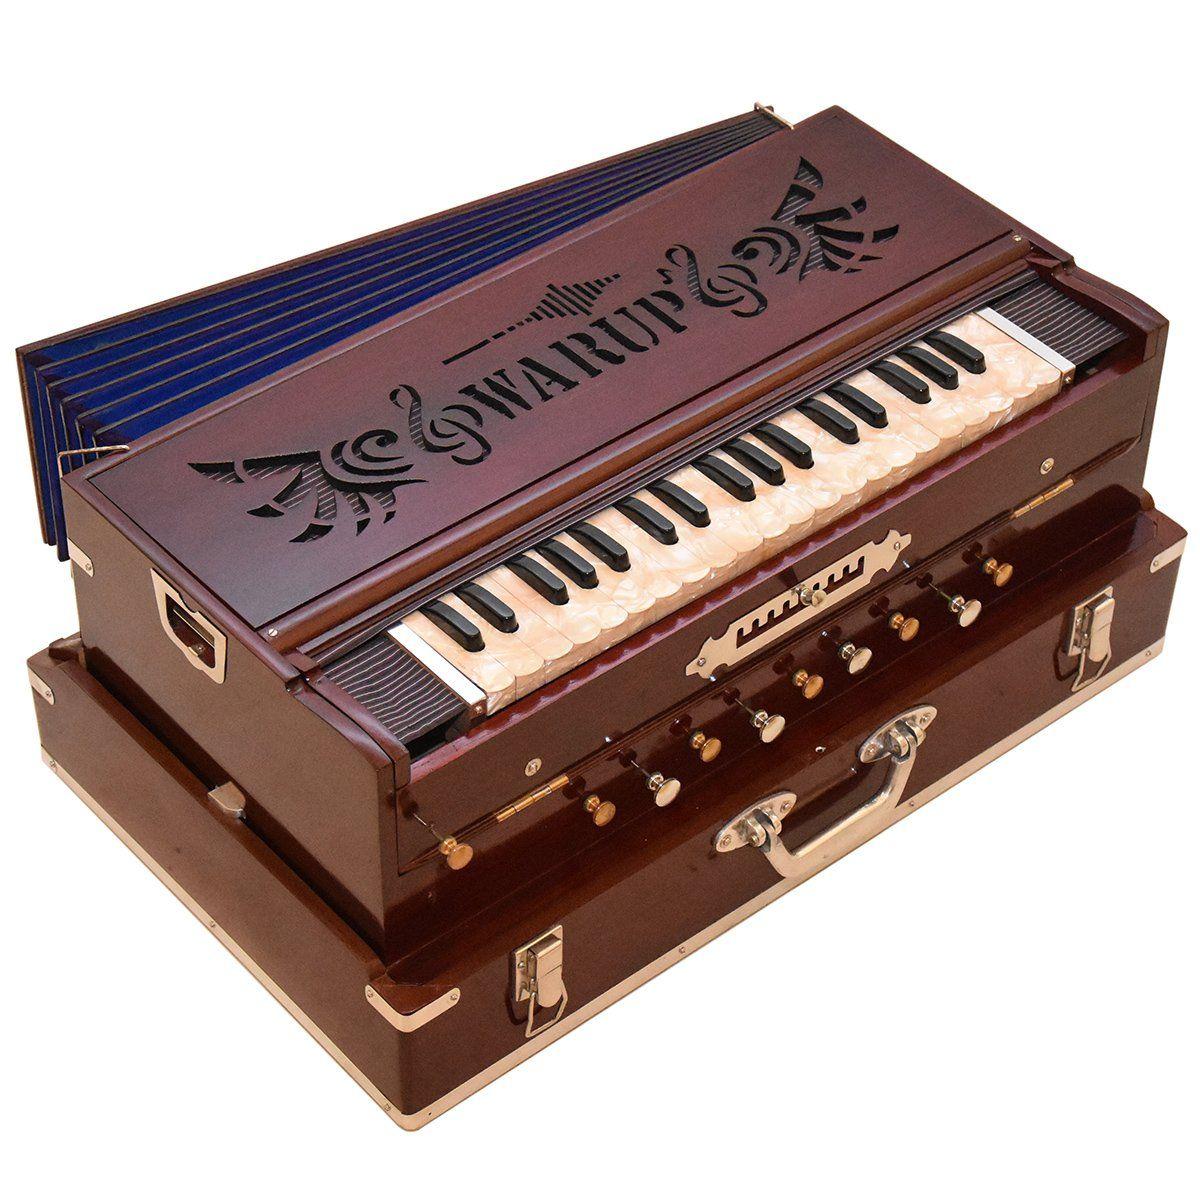 Swarup Standard 9/3 Harmonium | Indian instruments ...